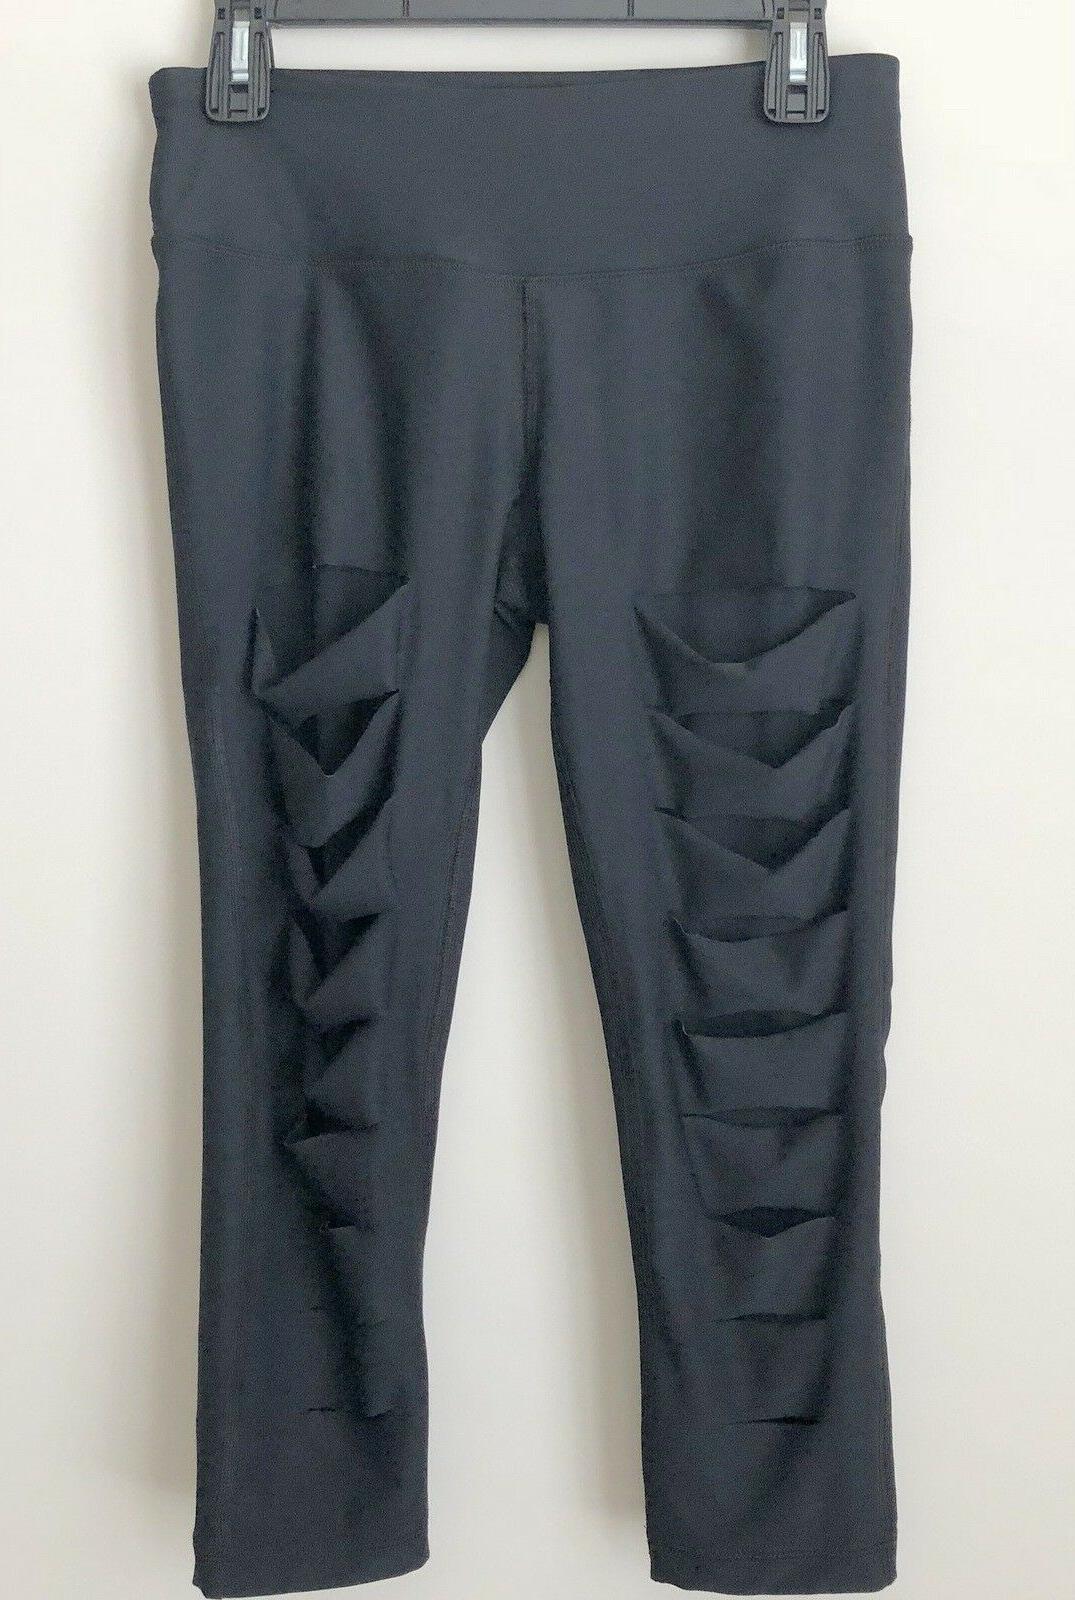 new capri black pants cut front size